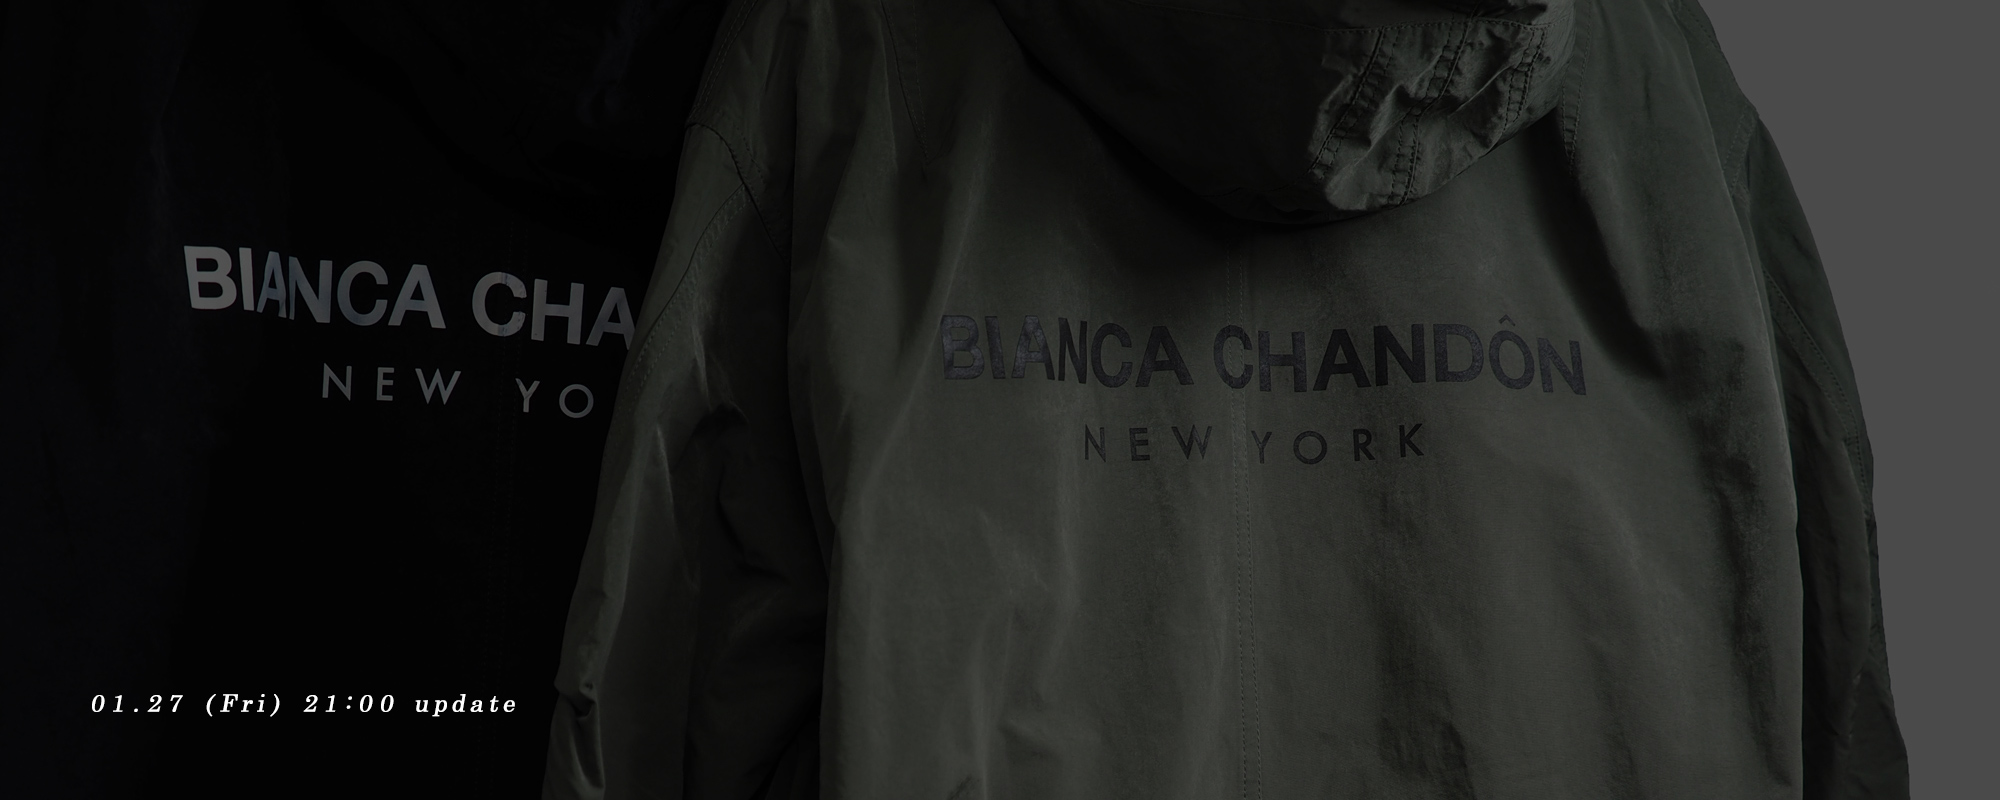 Bianca Chandon